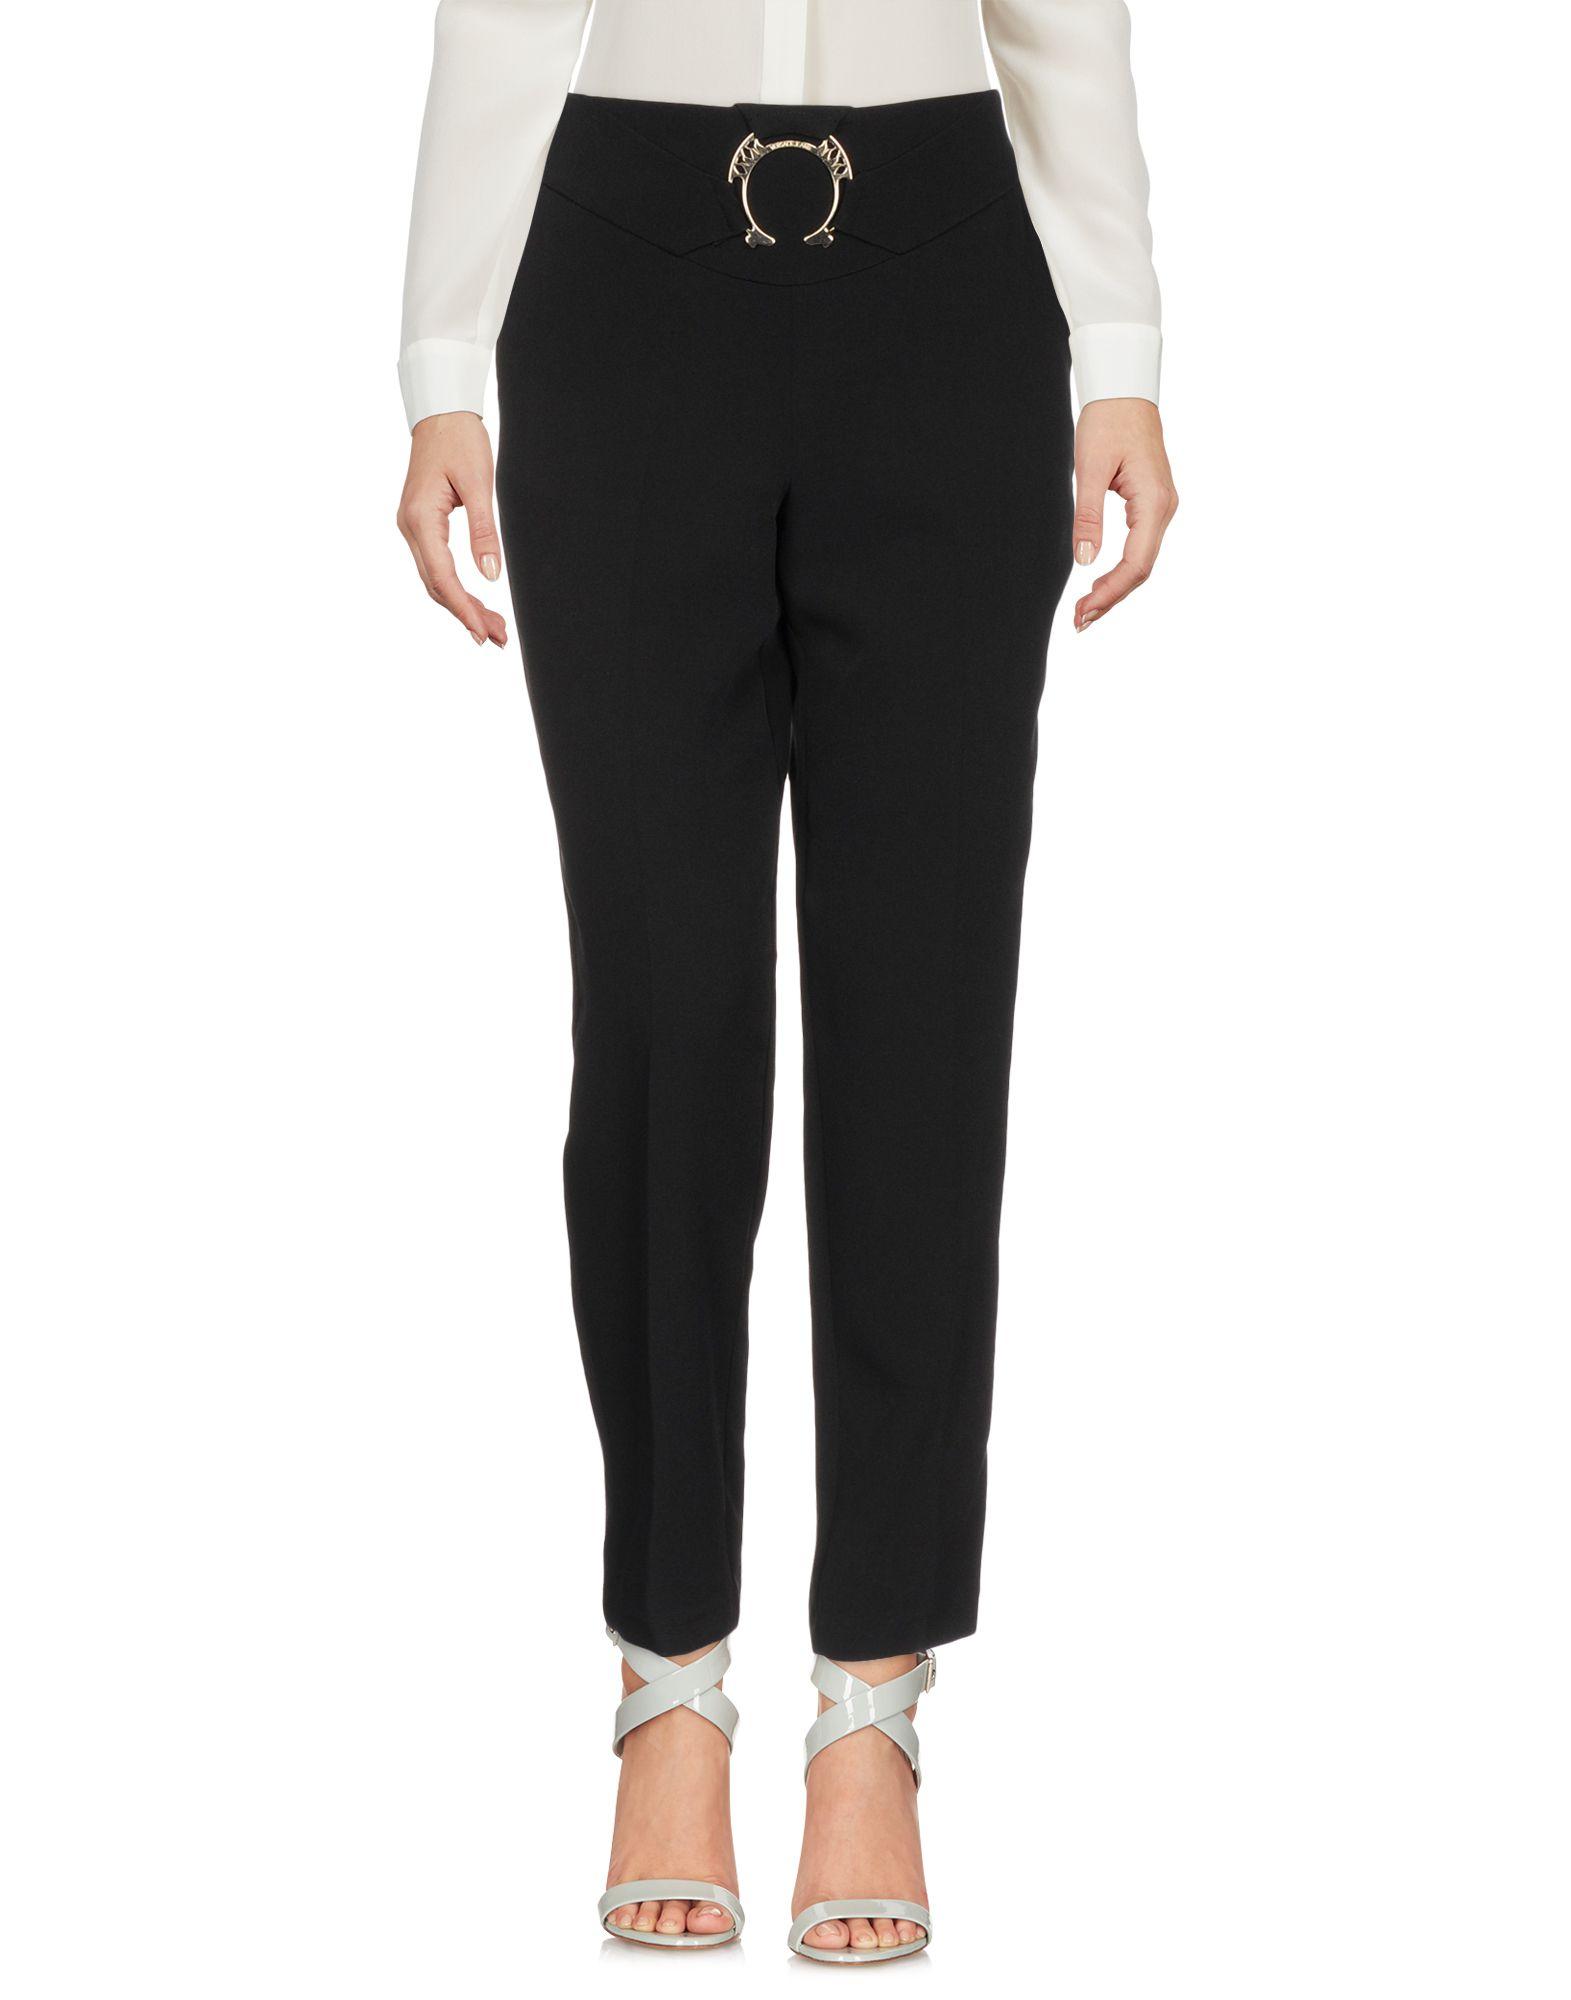 Pantalone  ersace ersace Jeans donna - 13159962TC